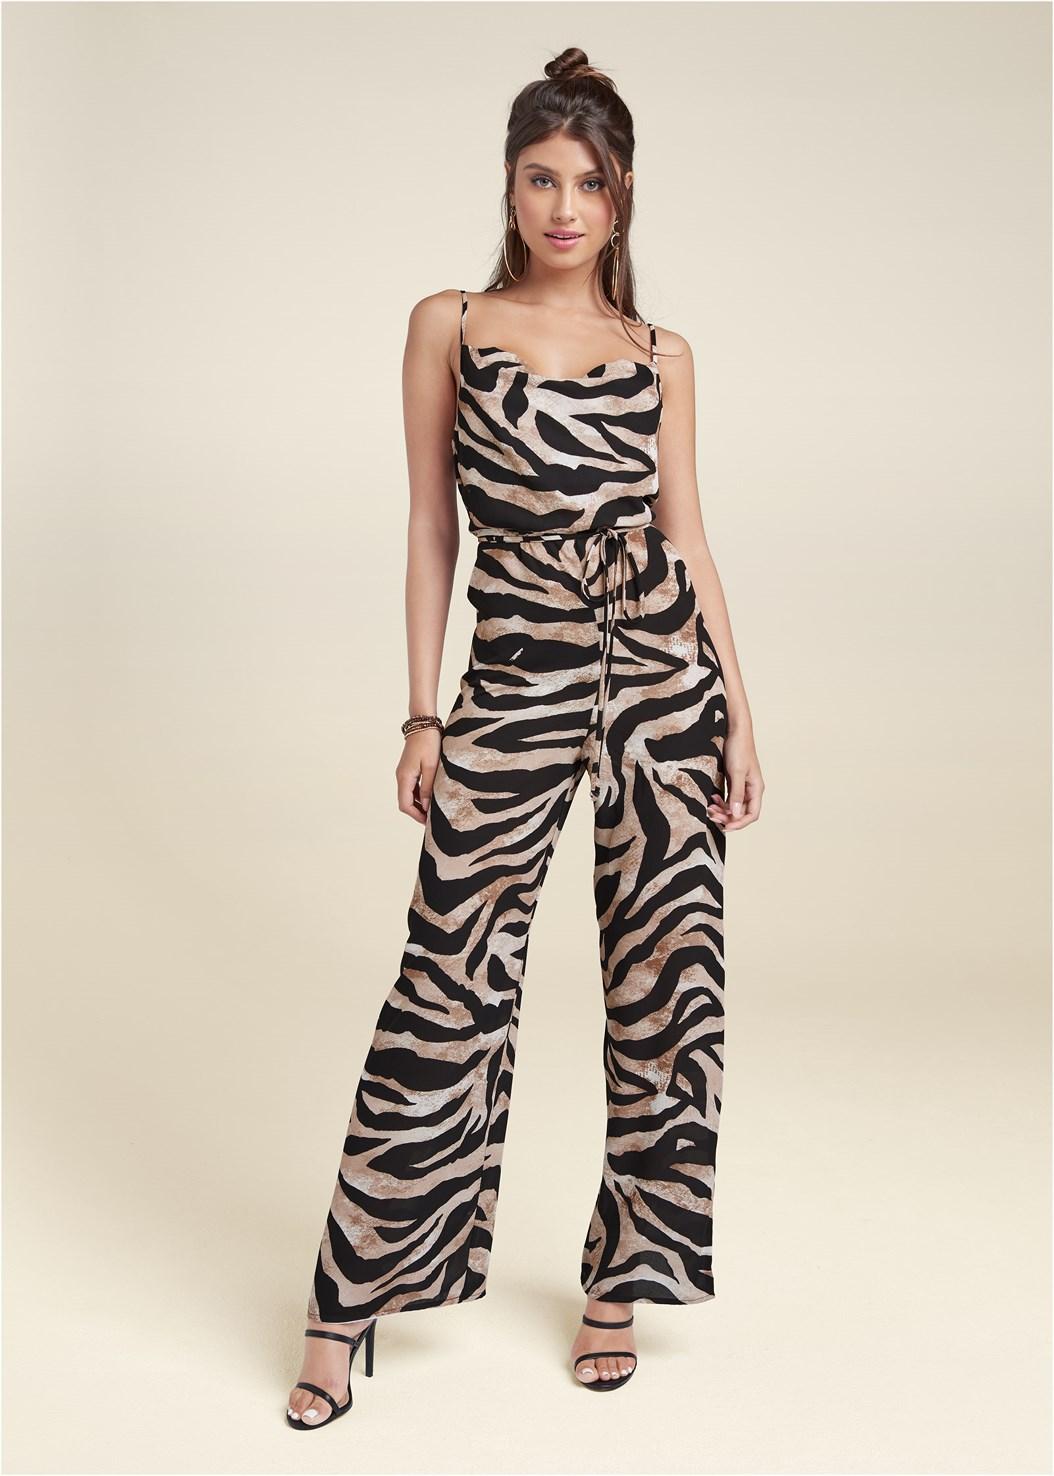 Wide Leg Tiger Print Jumpsuit,High Heel Strappy Sandals